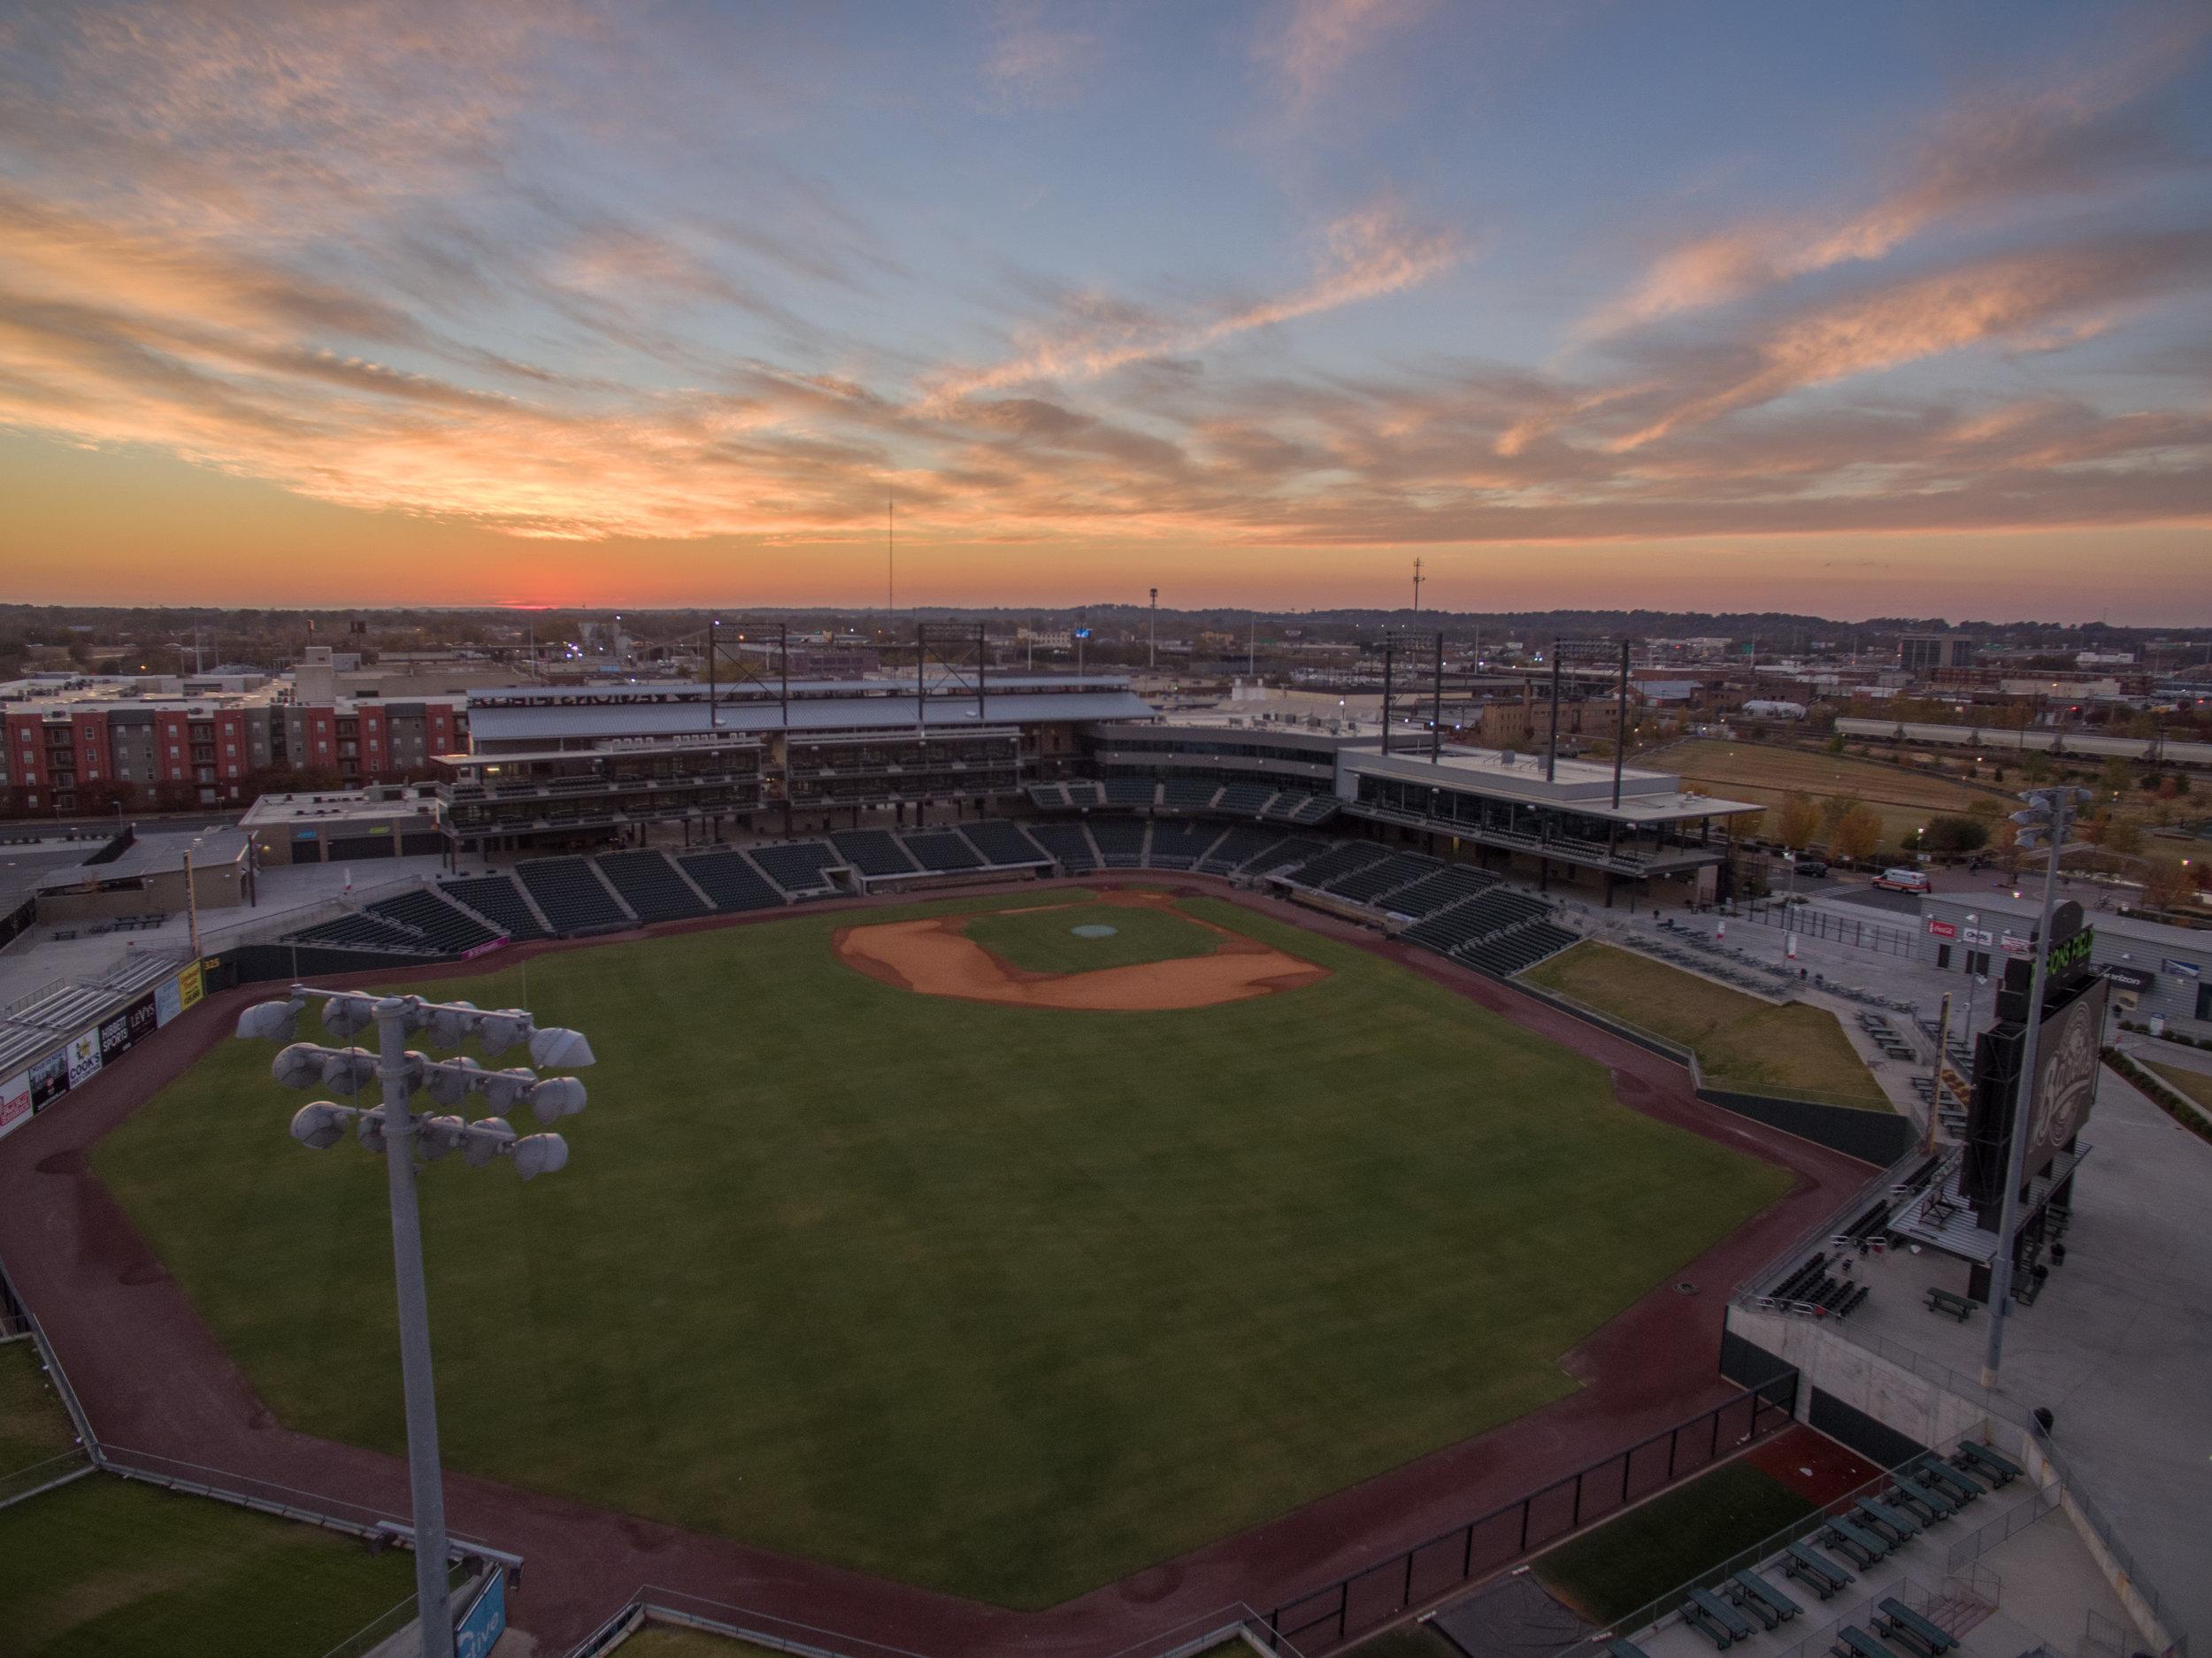 Sunset over Regions Field in Birmingham